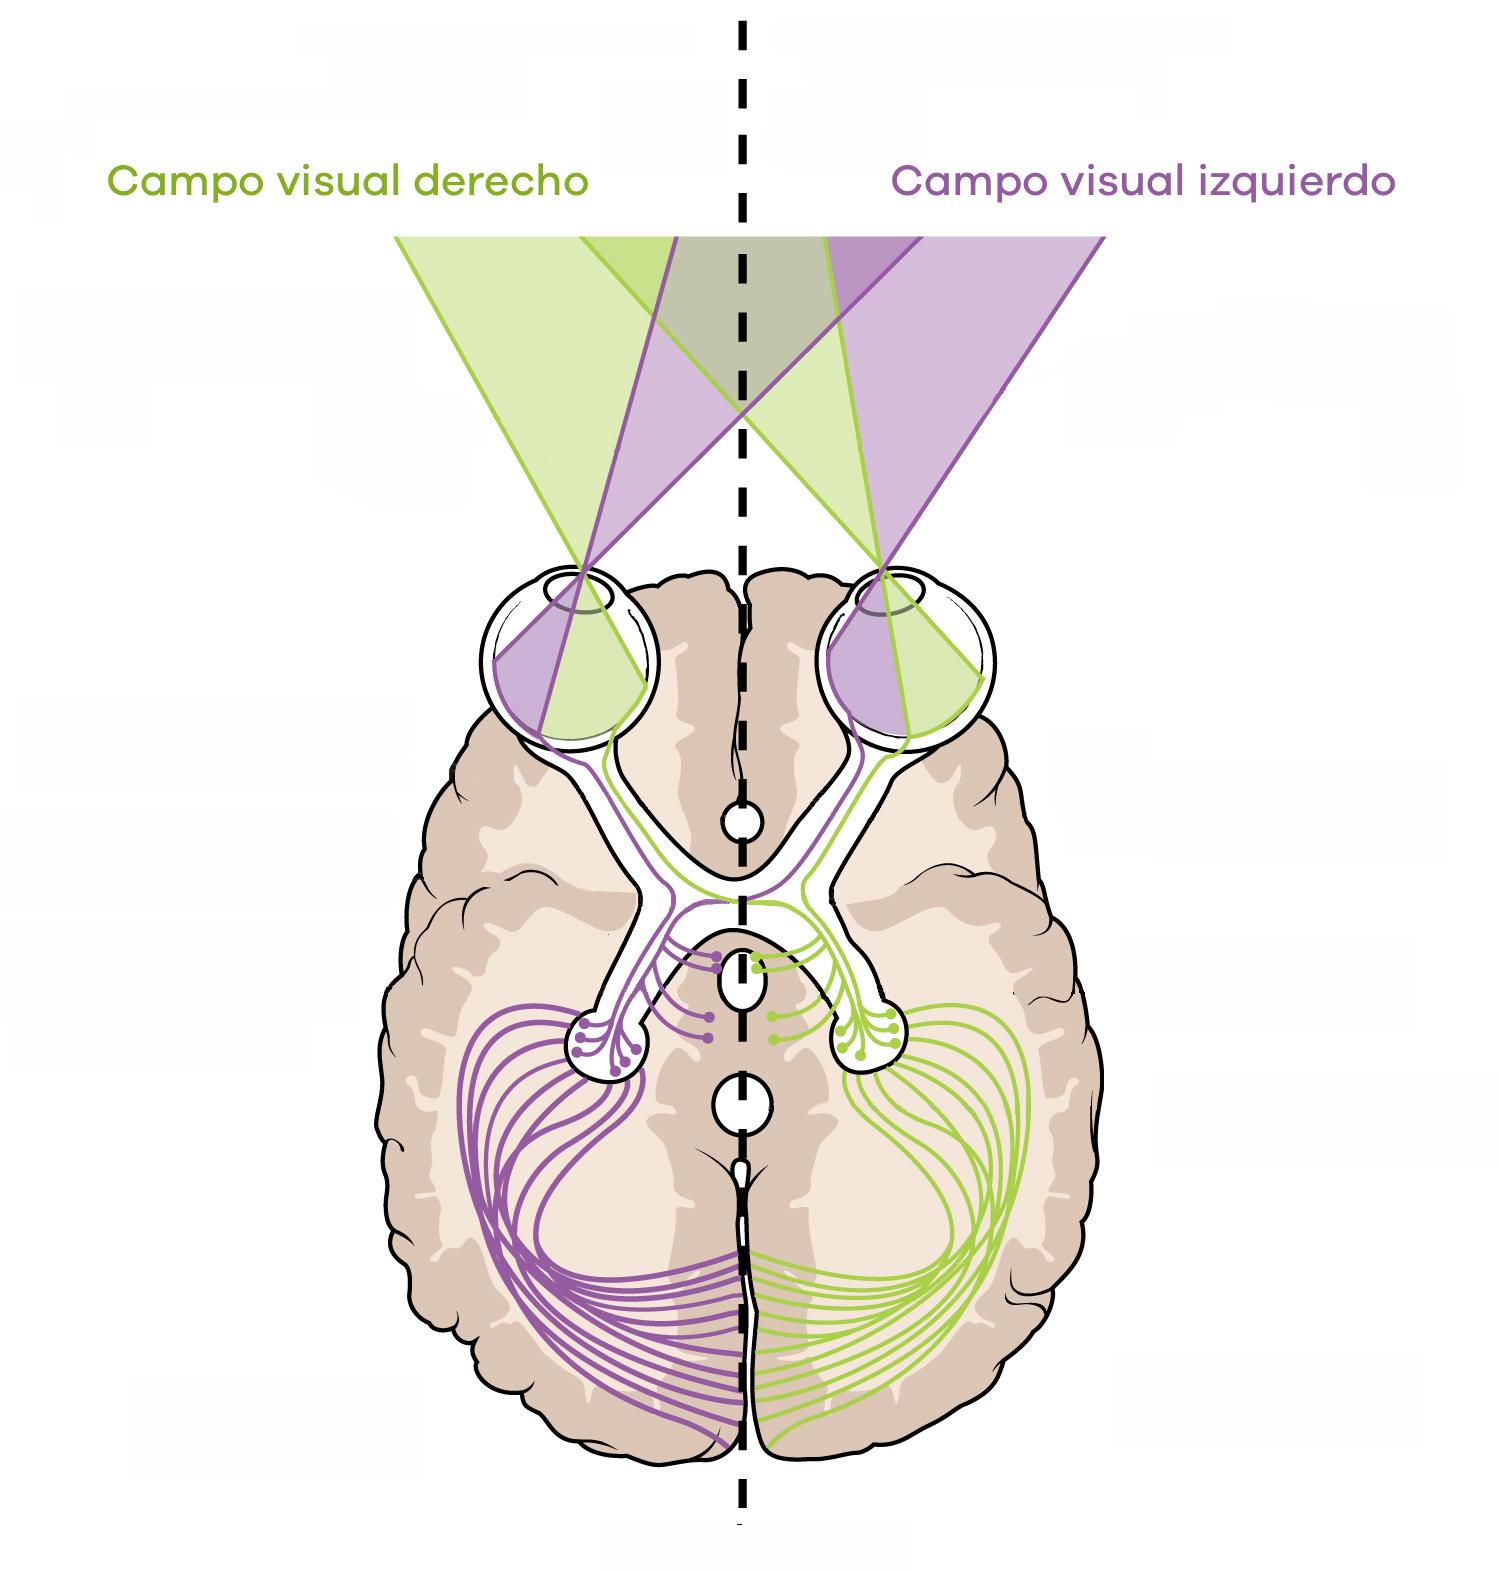 Campo visual derecho e izquierdo